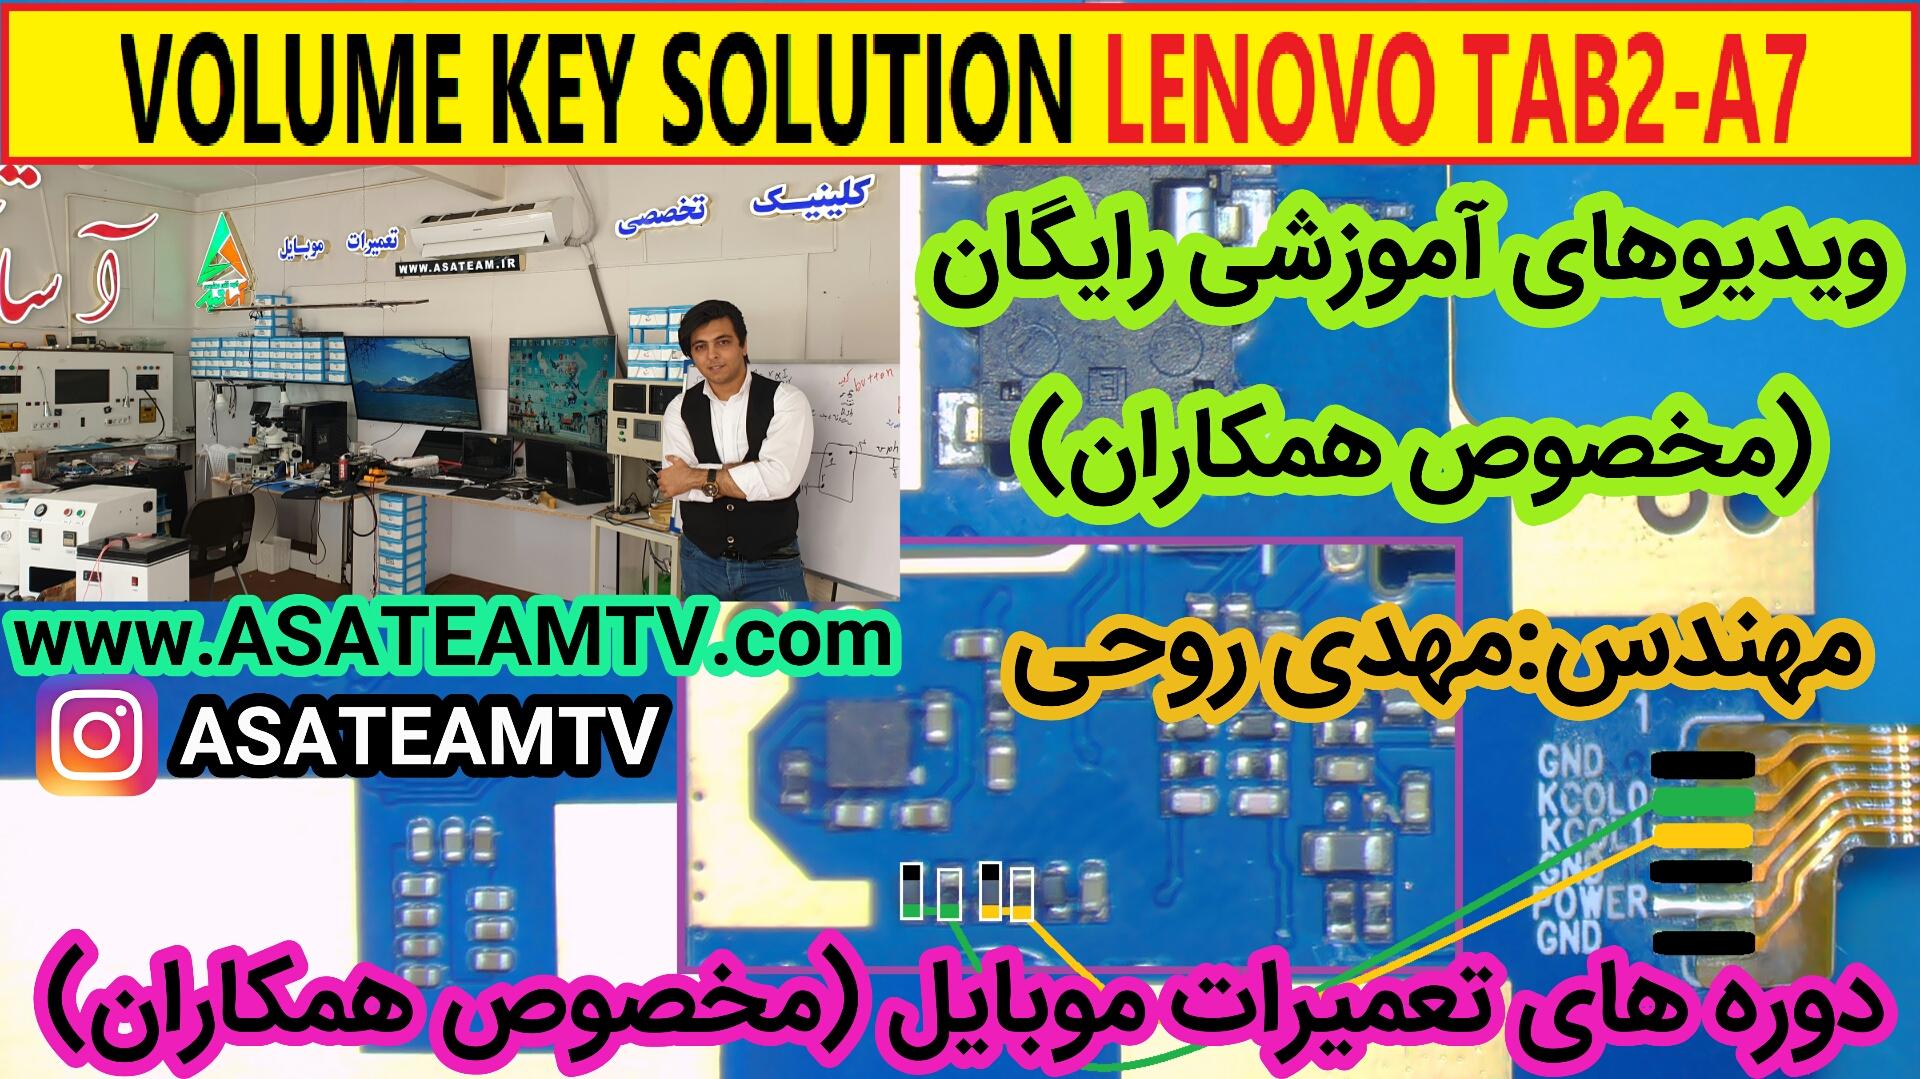 solution volume keyTAB2-A7